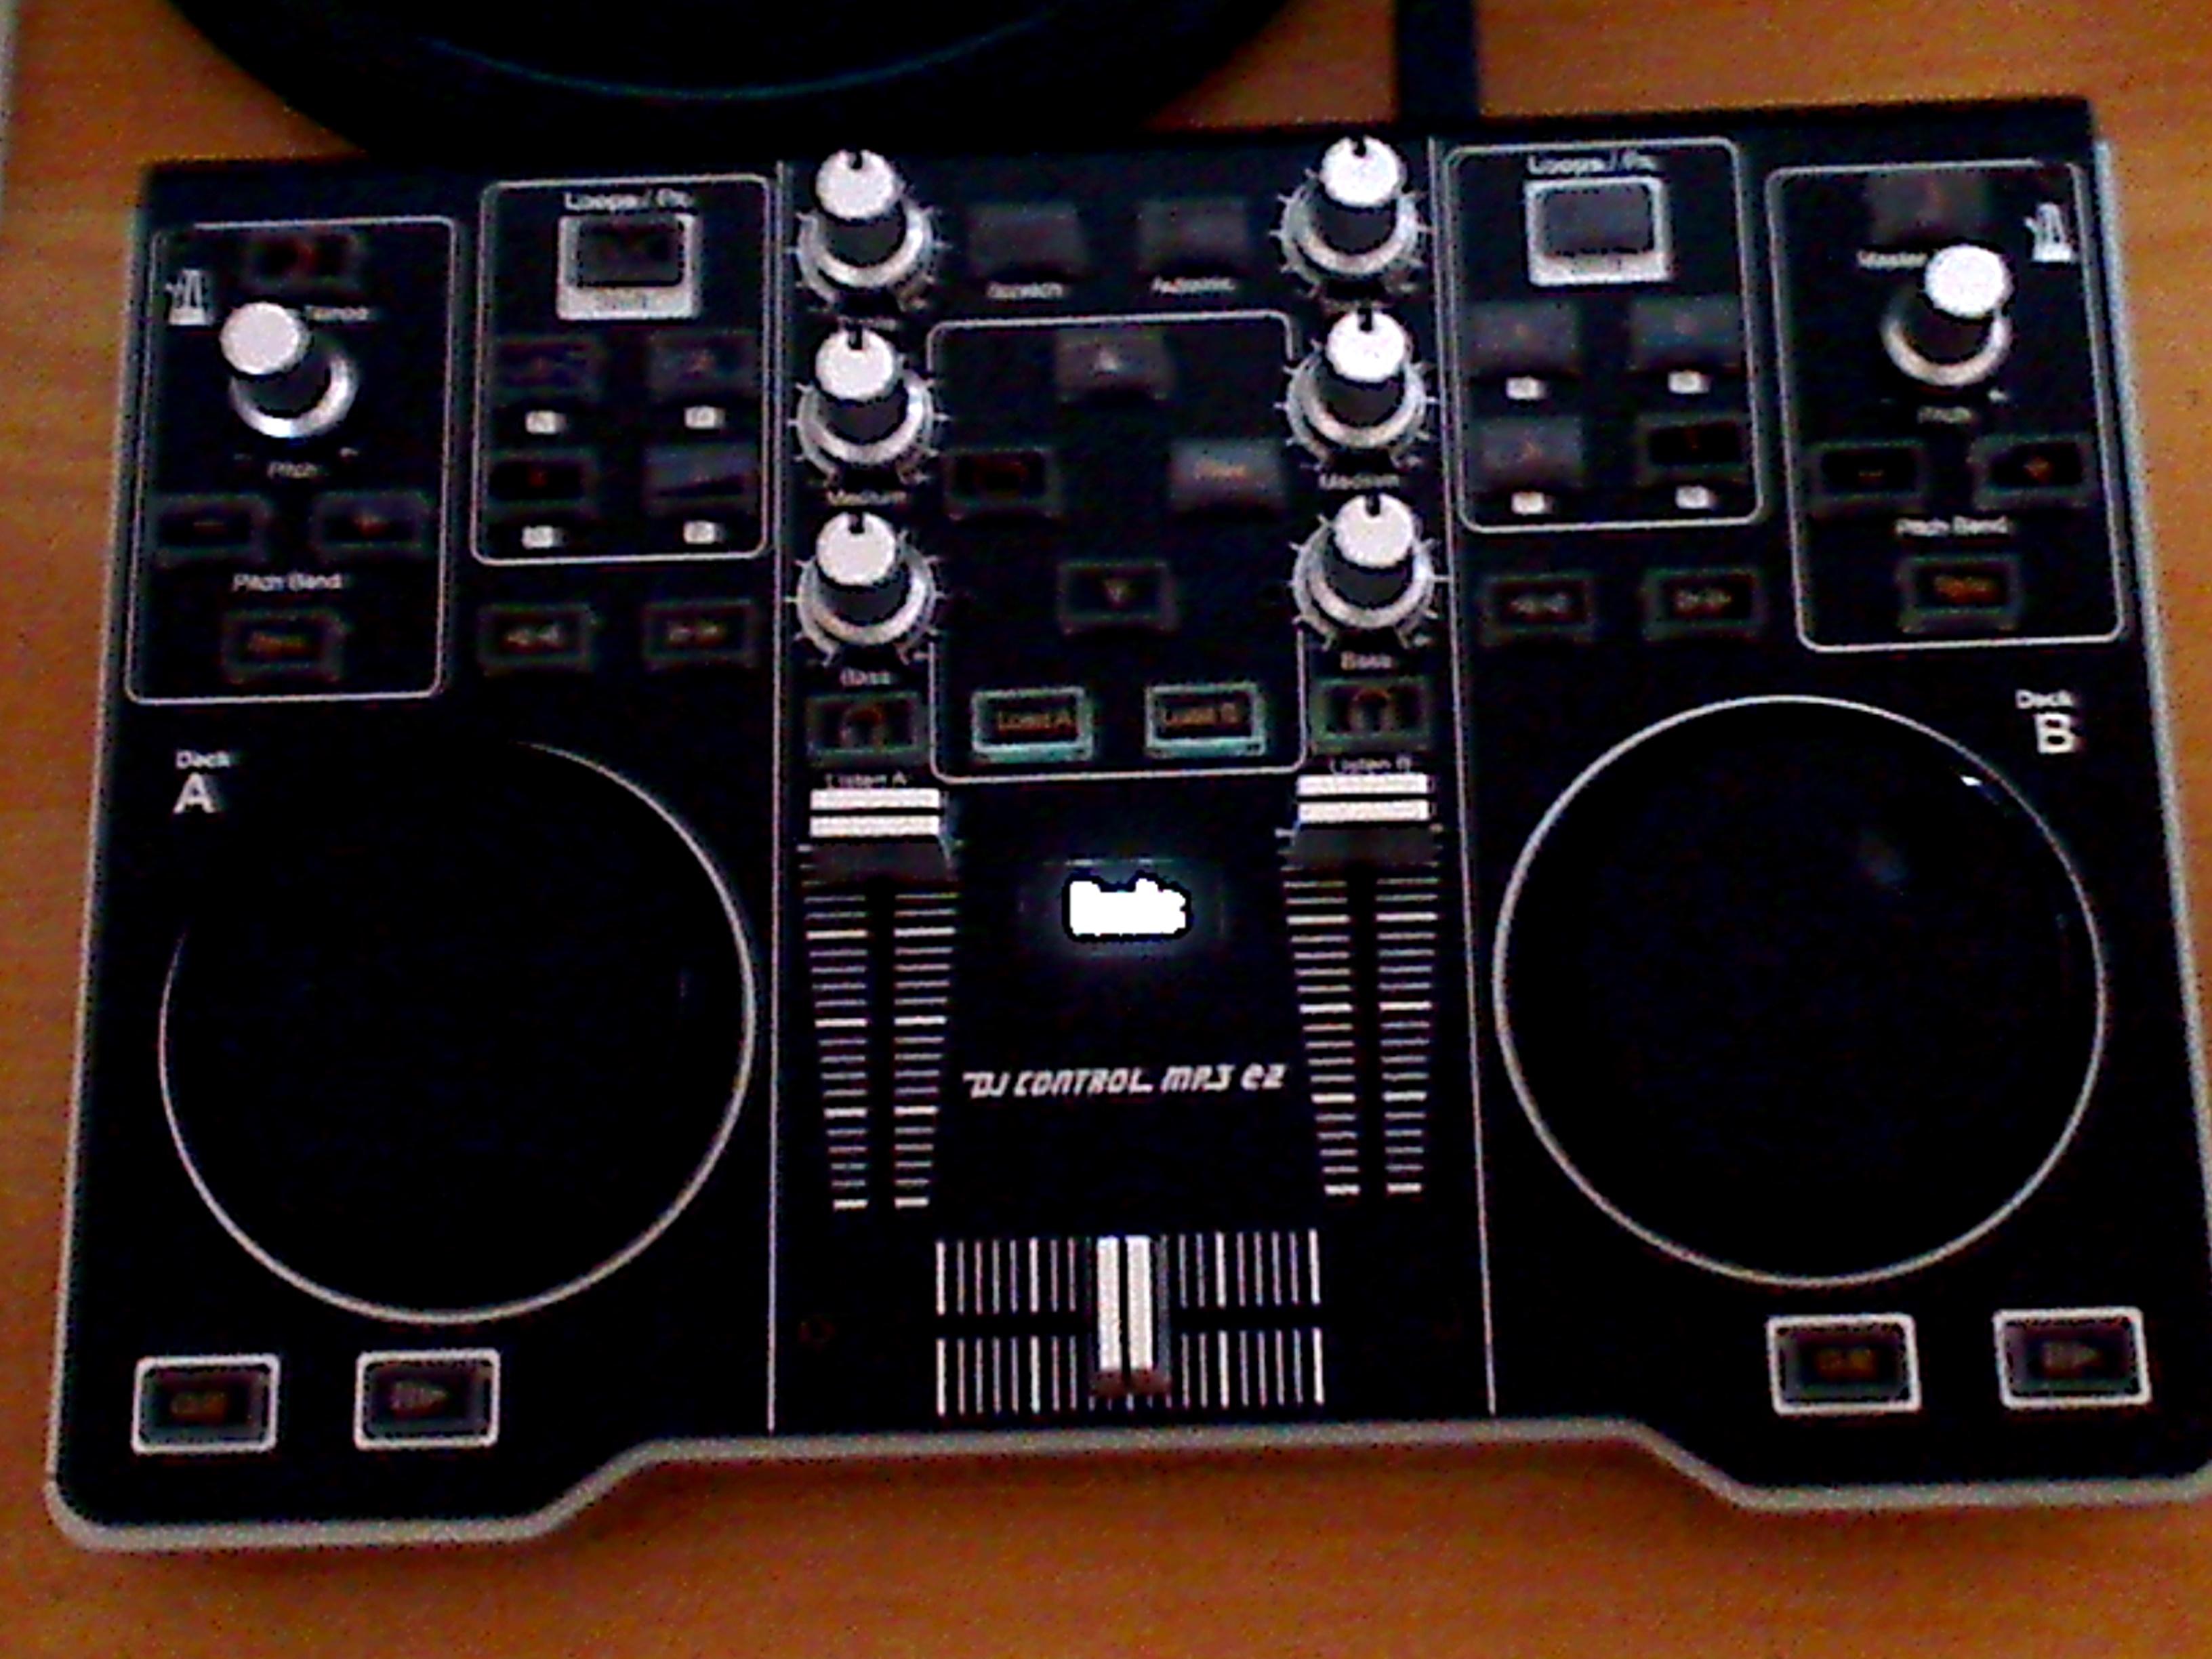 Hercules DJ Control MP3 e2 image (#522575) - Audiofanzine